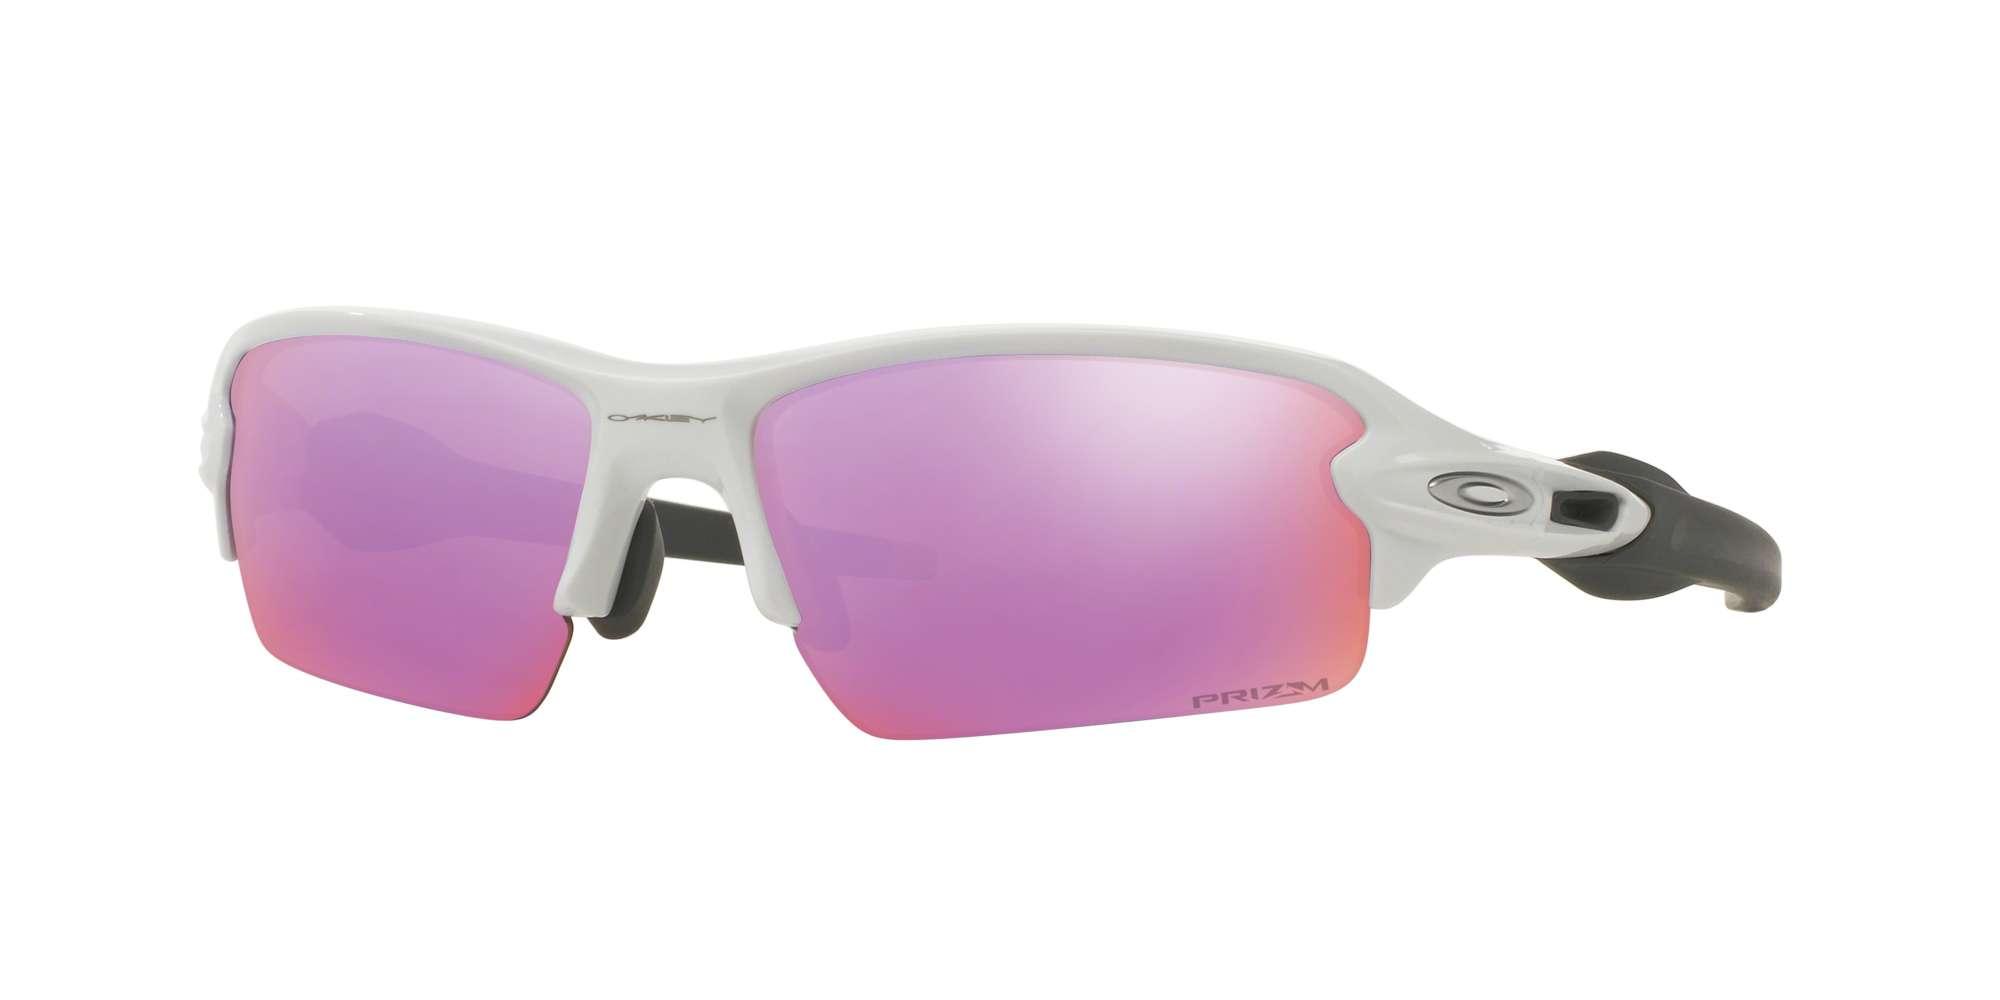 POLISHED WHITE / Prizm Golf lenses